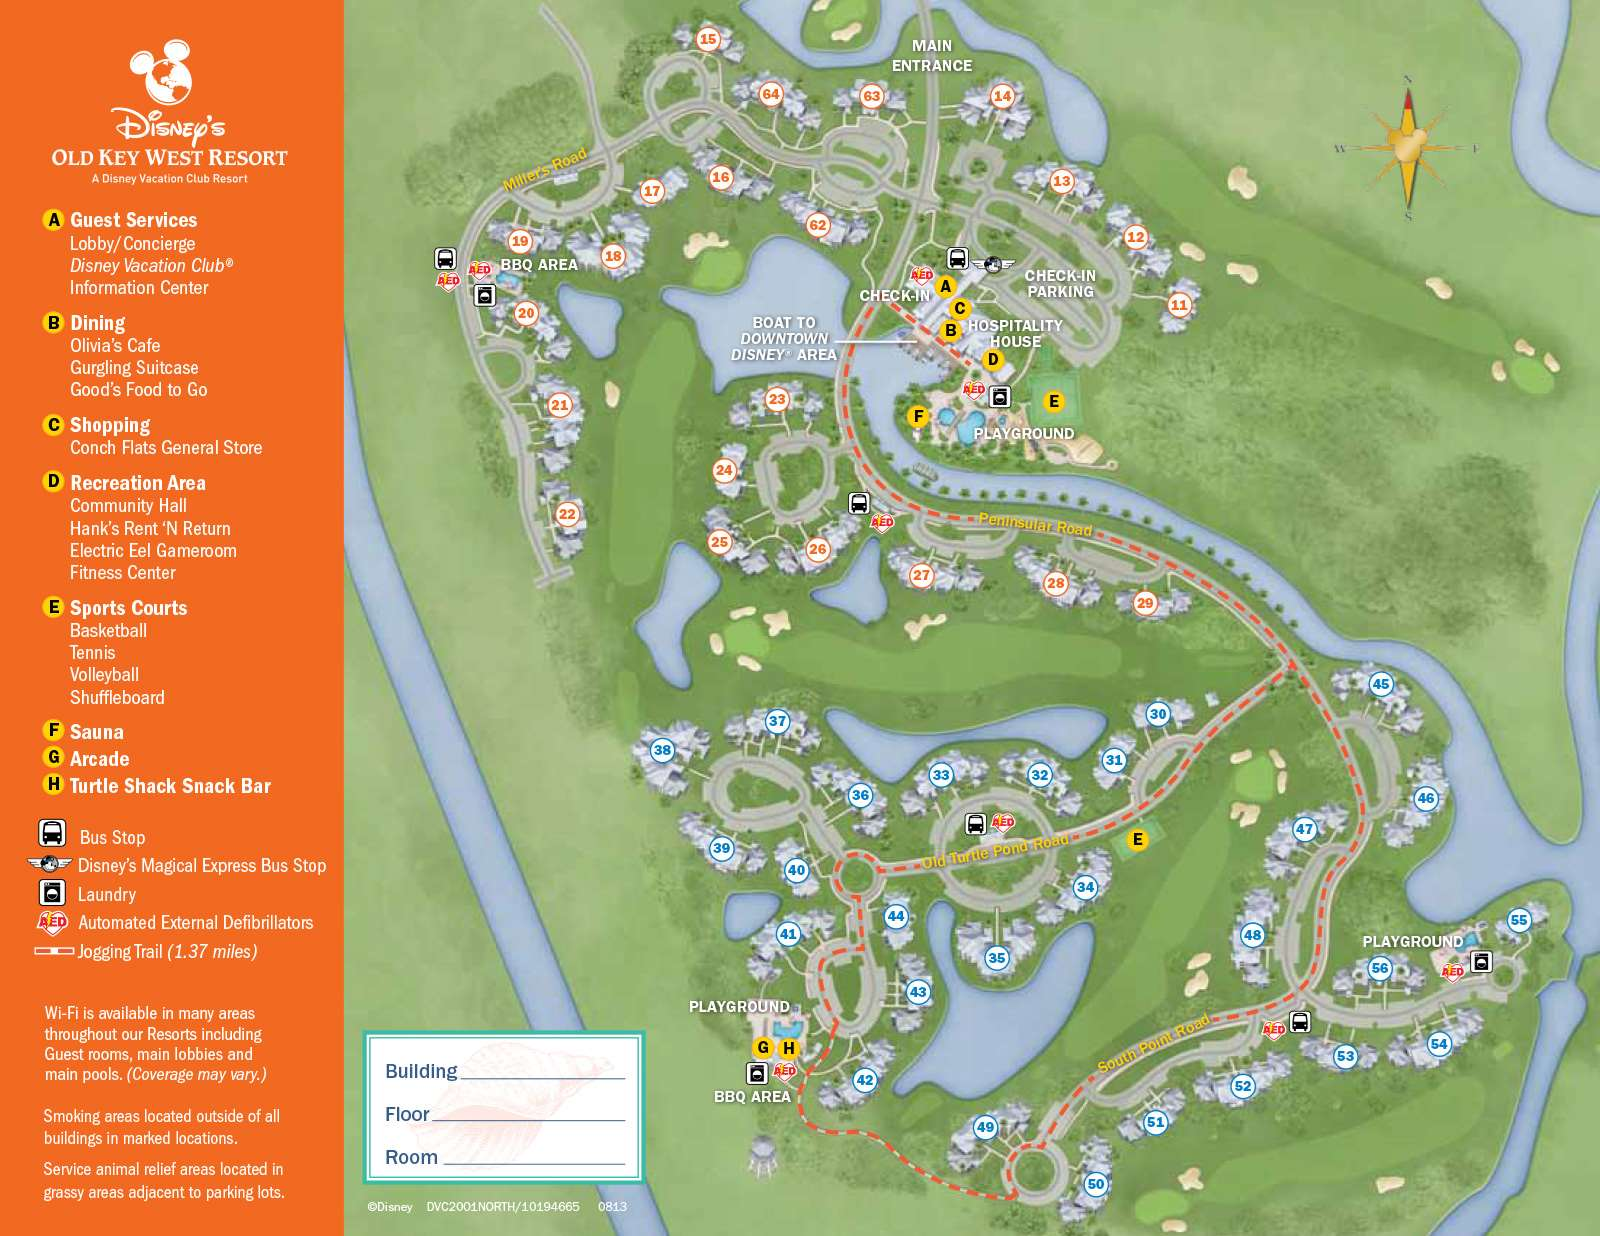 PHOTOS New Design Of Maps Now At Walt Disney World Resort Hotels - Map florida keys hotels